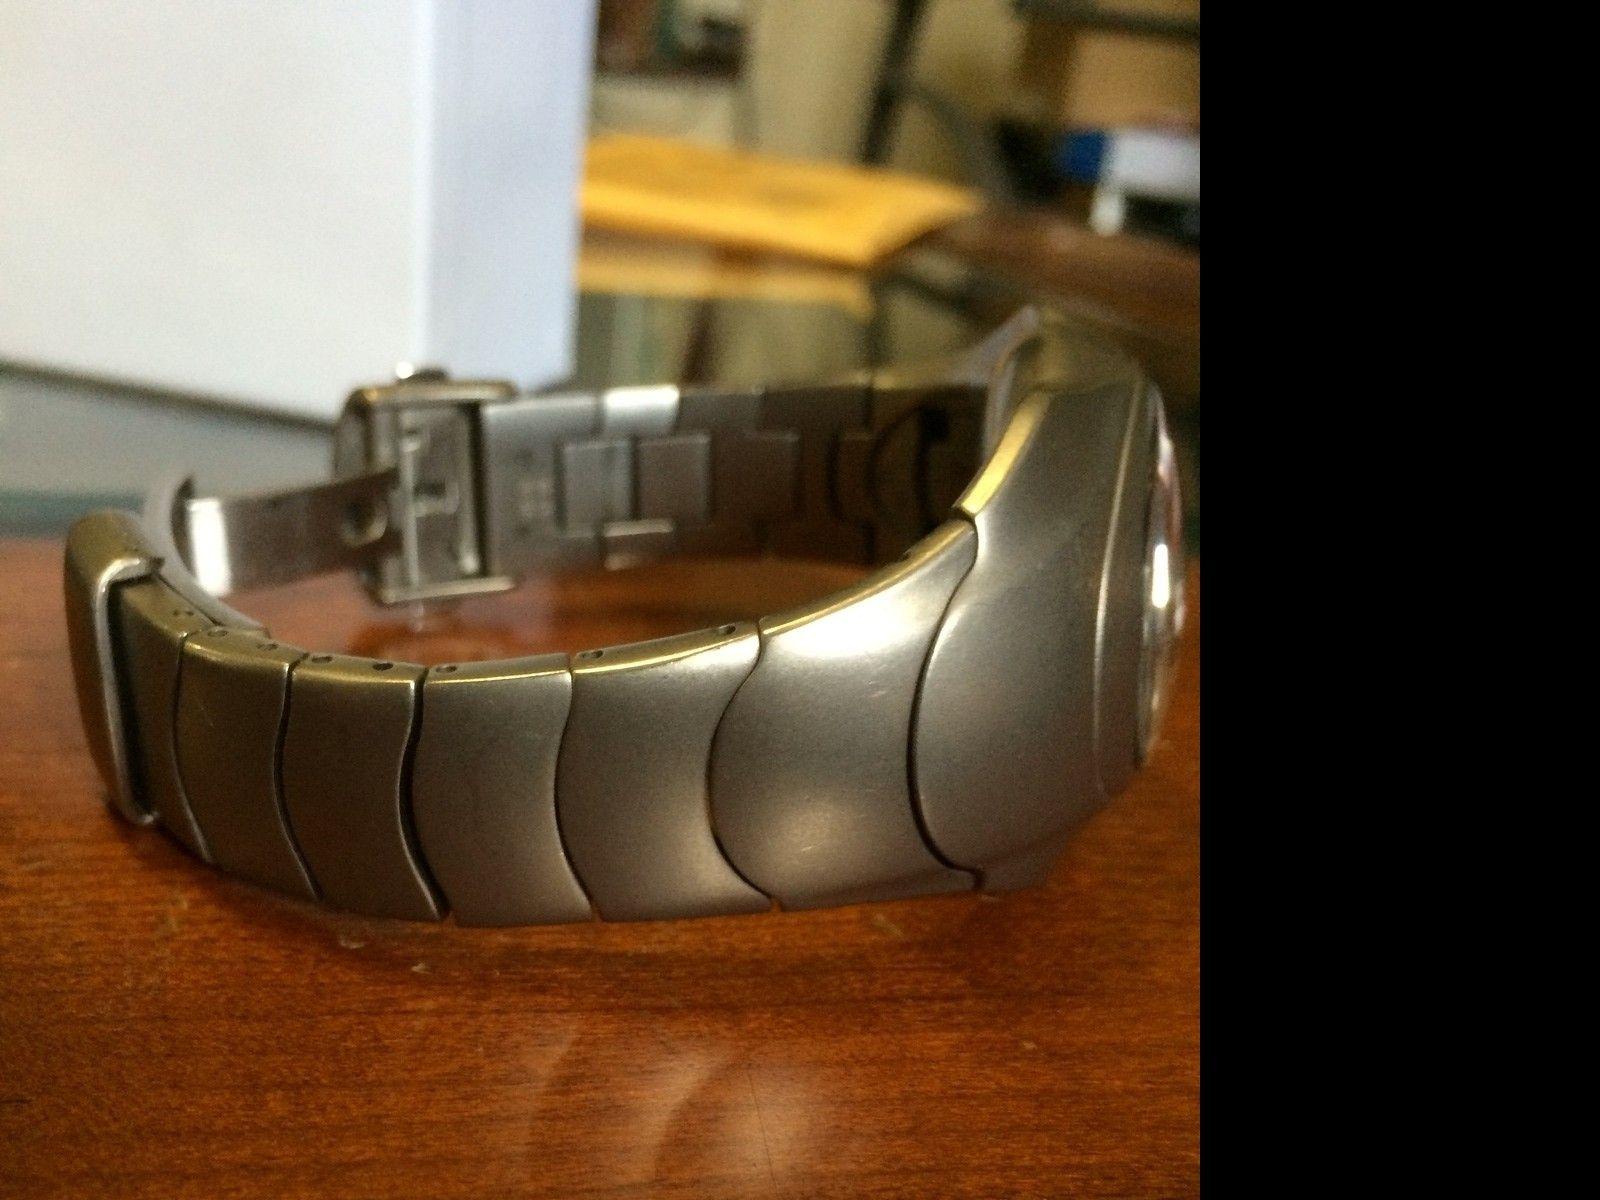 Oakley Time Bomb - photo 2.JPG